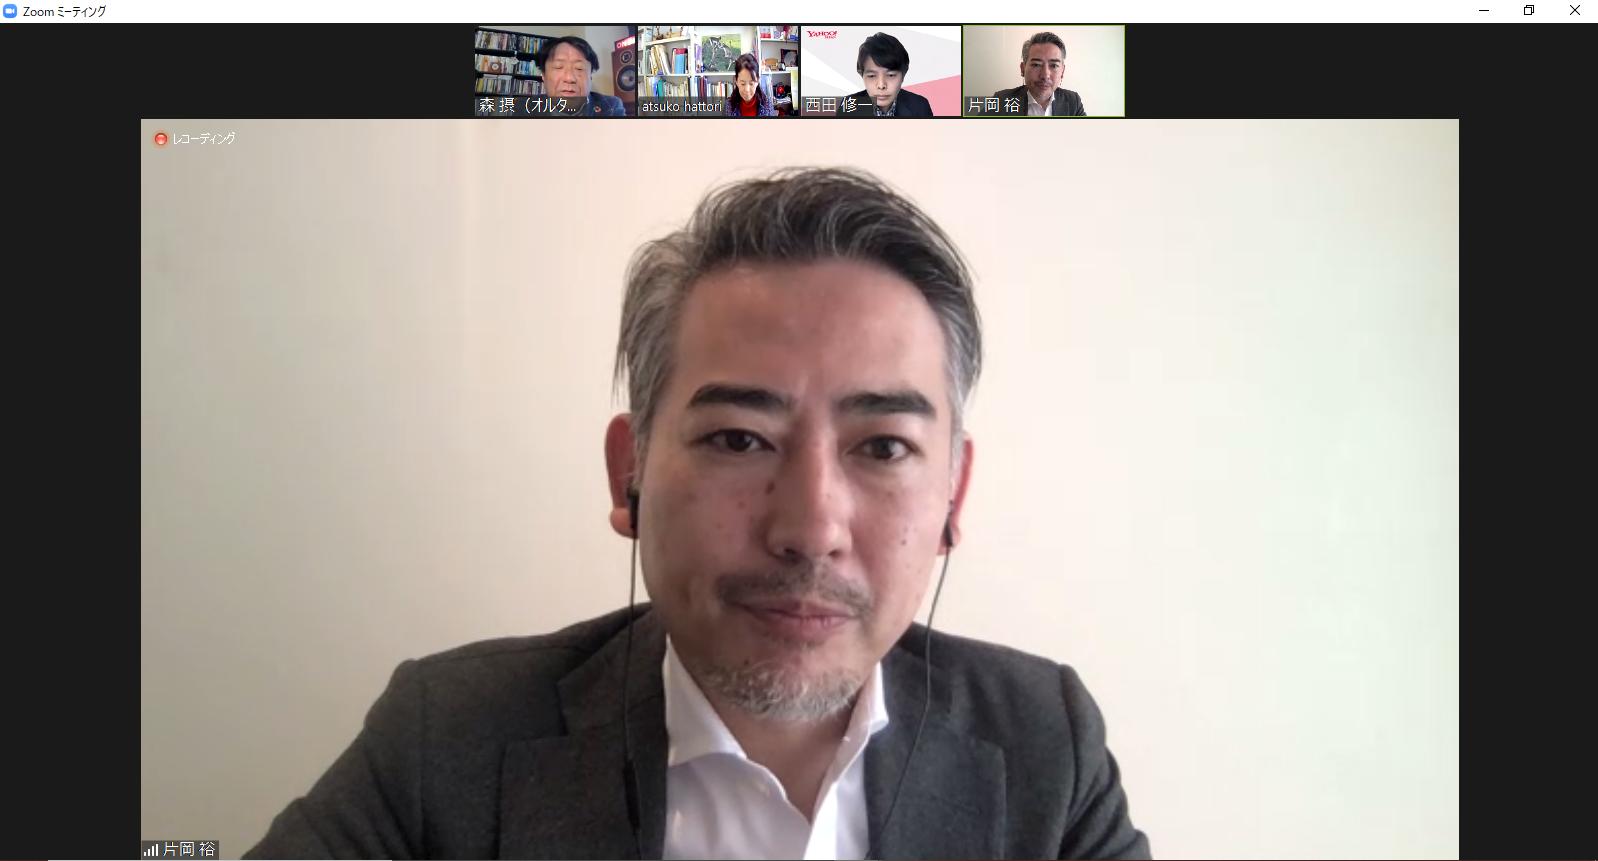 Kataoka speaking at a ZOOM interview.